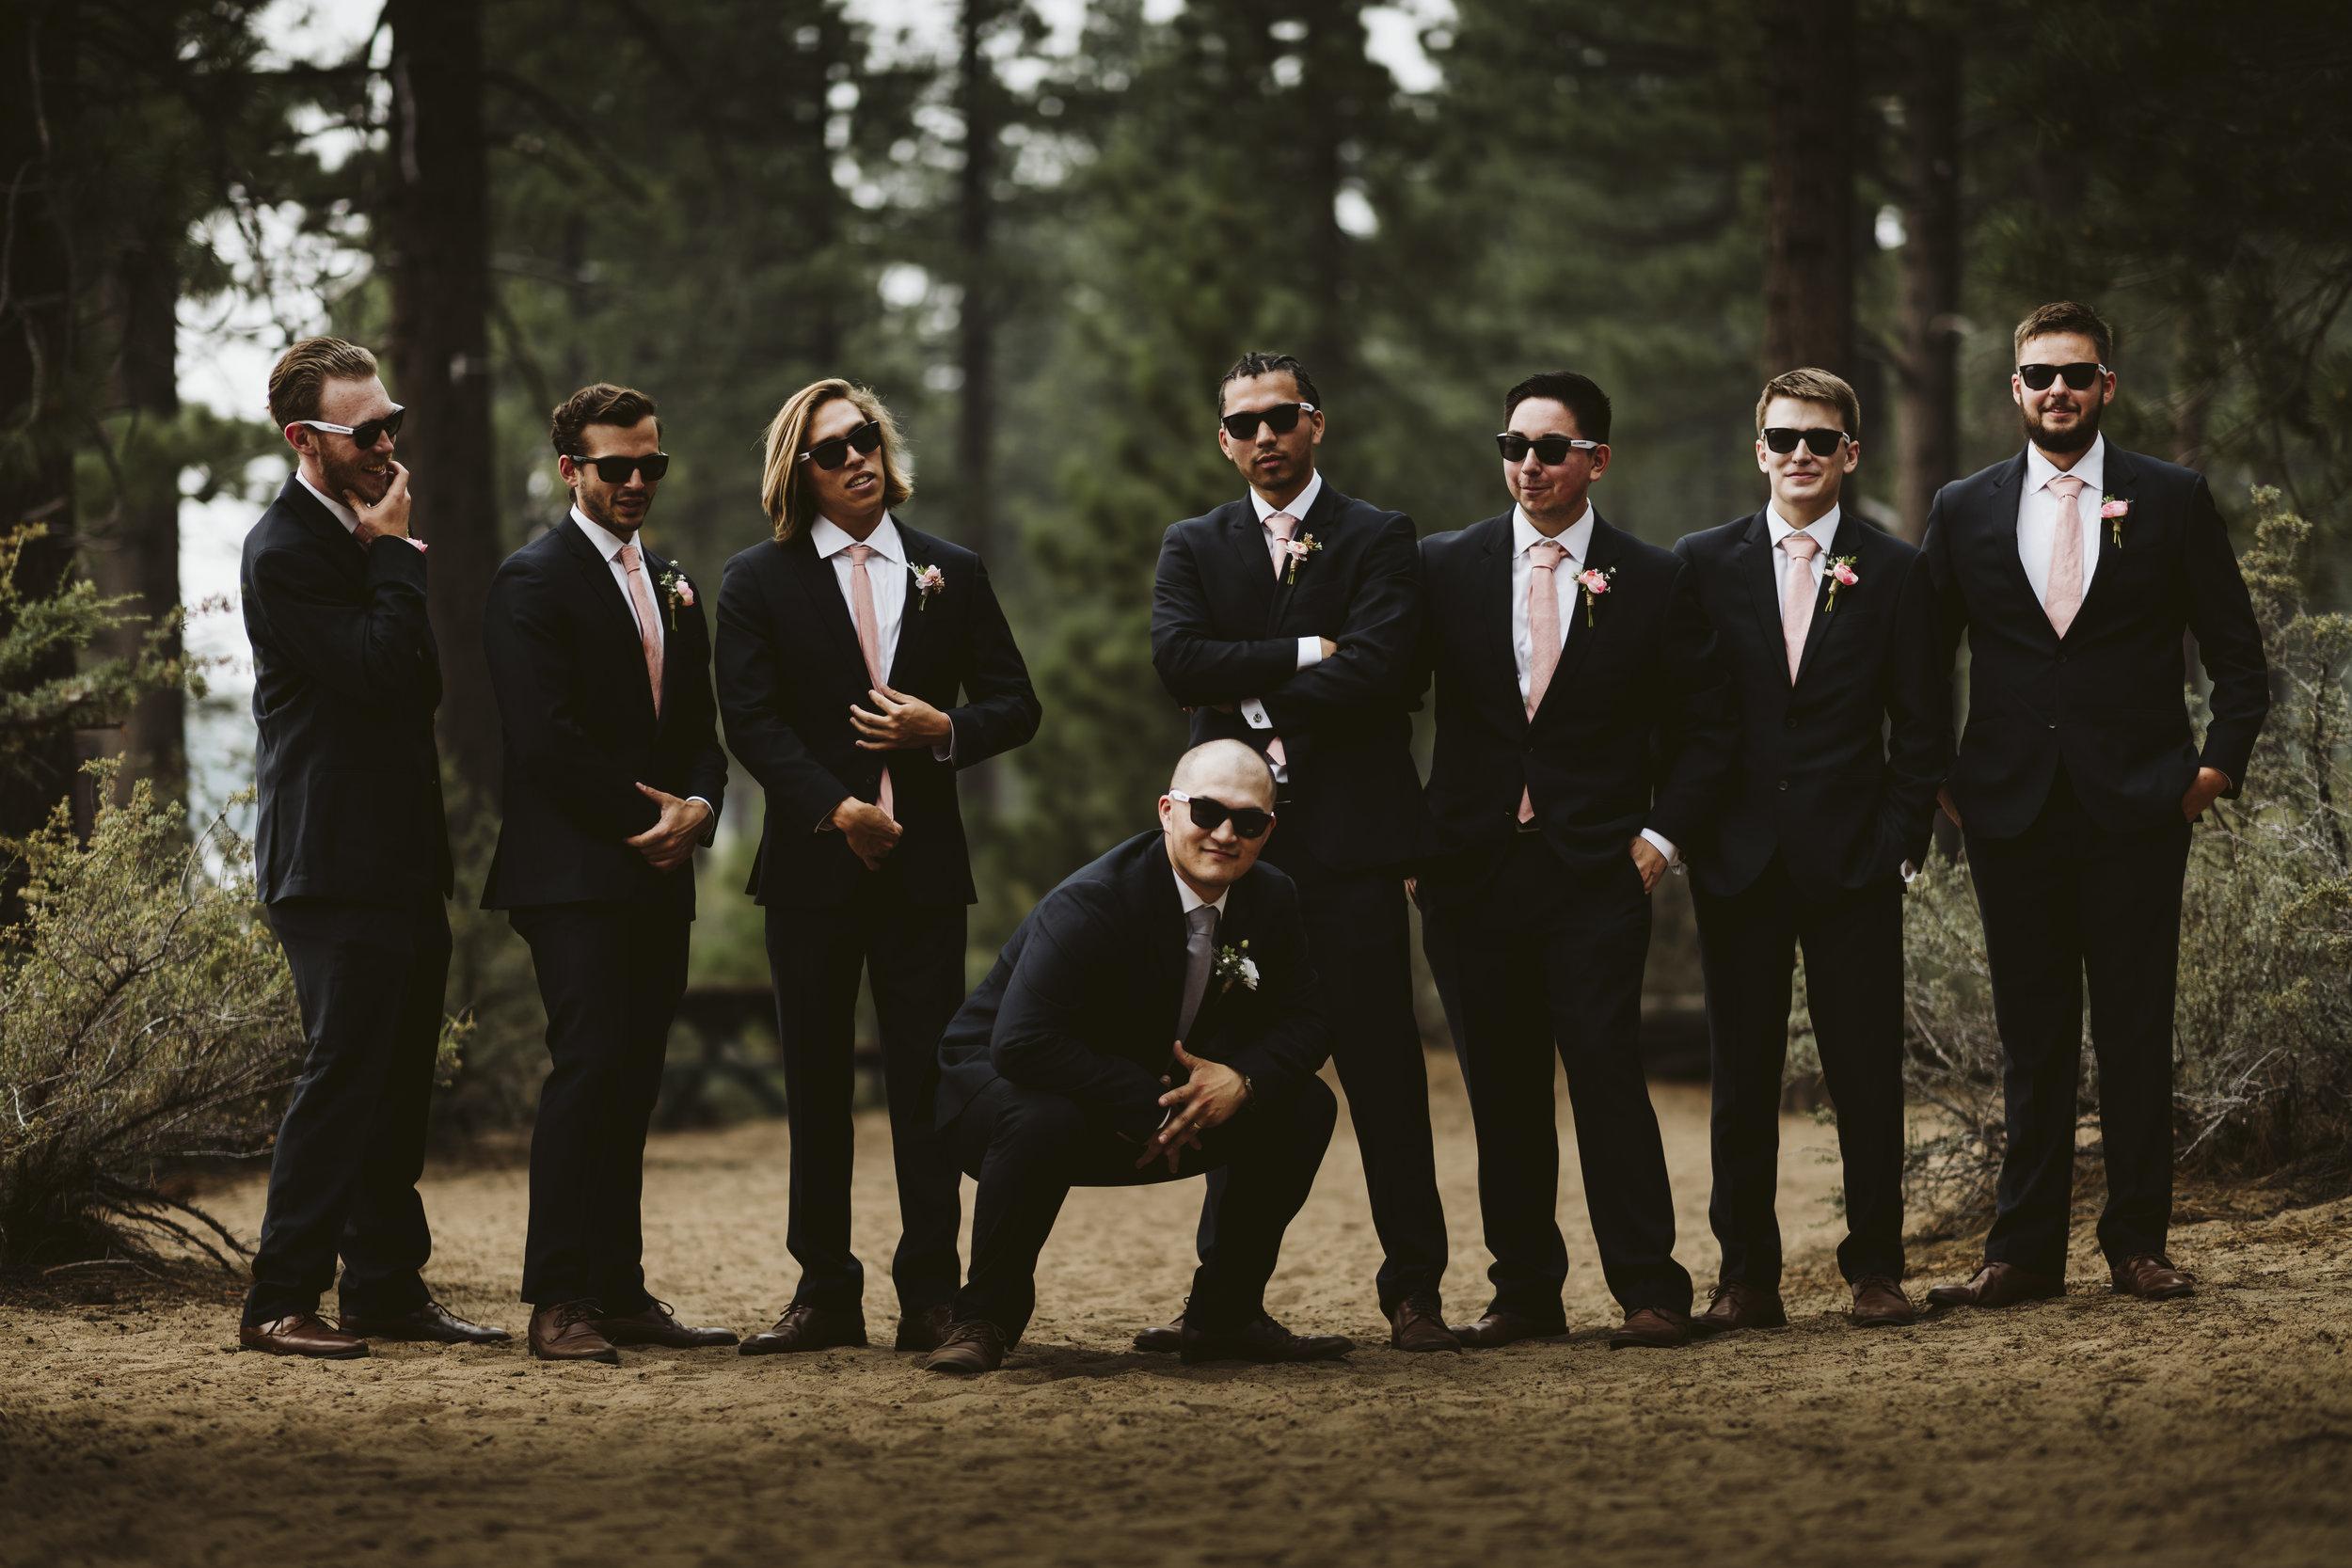 _P8A4456vild-vild photography-photography-wedding-wedding photography-tahoe-lake tahoe-lake tahoe wedding photographer-nevada wedding photographer-mountain wedding.jpg